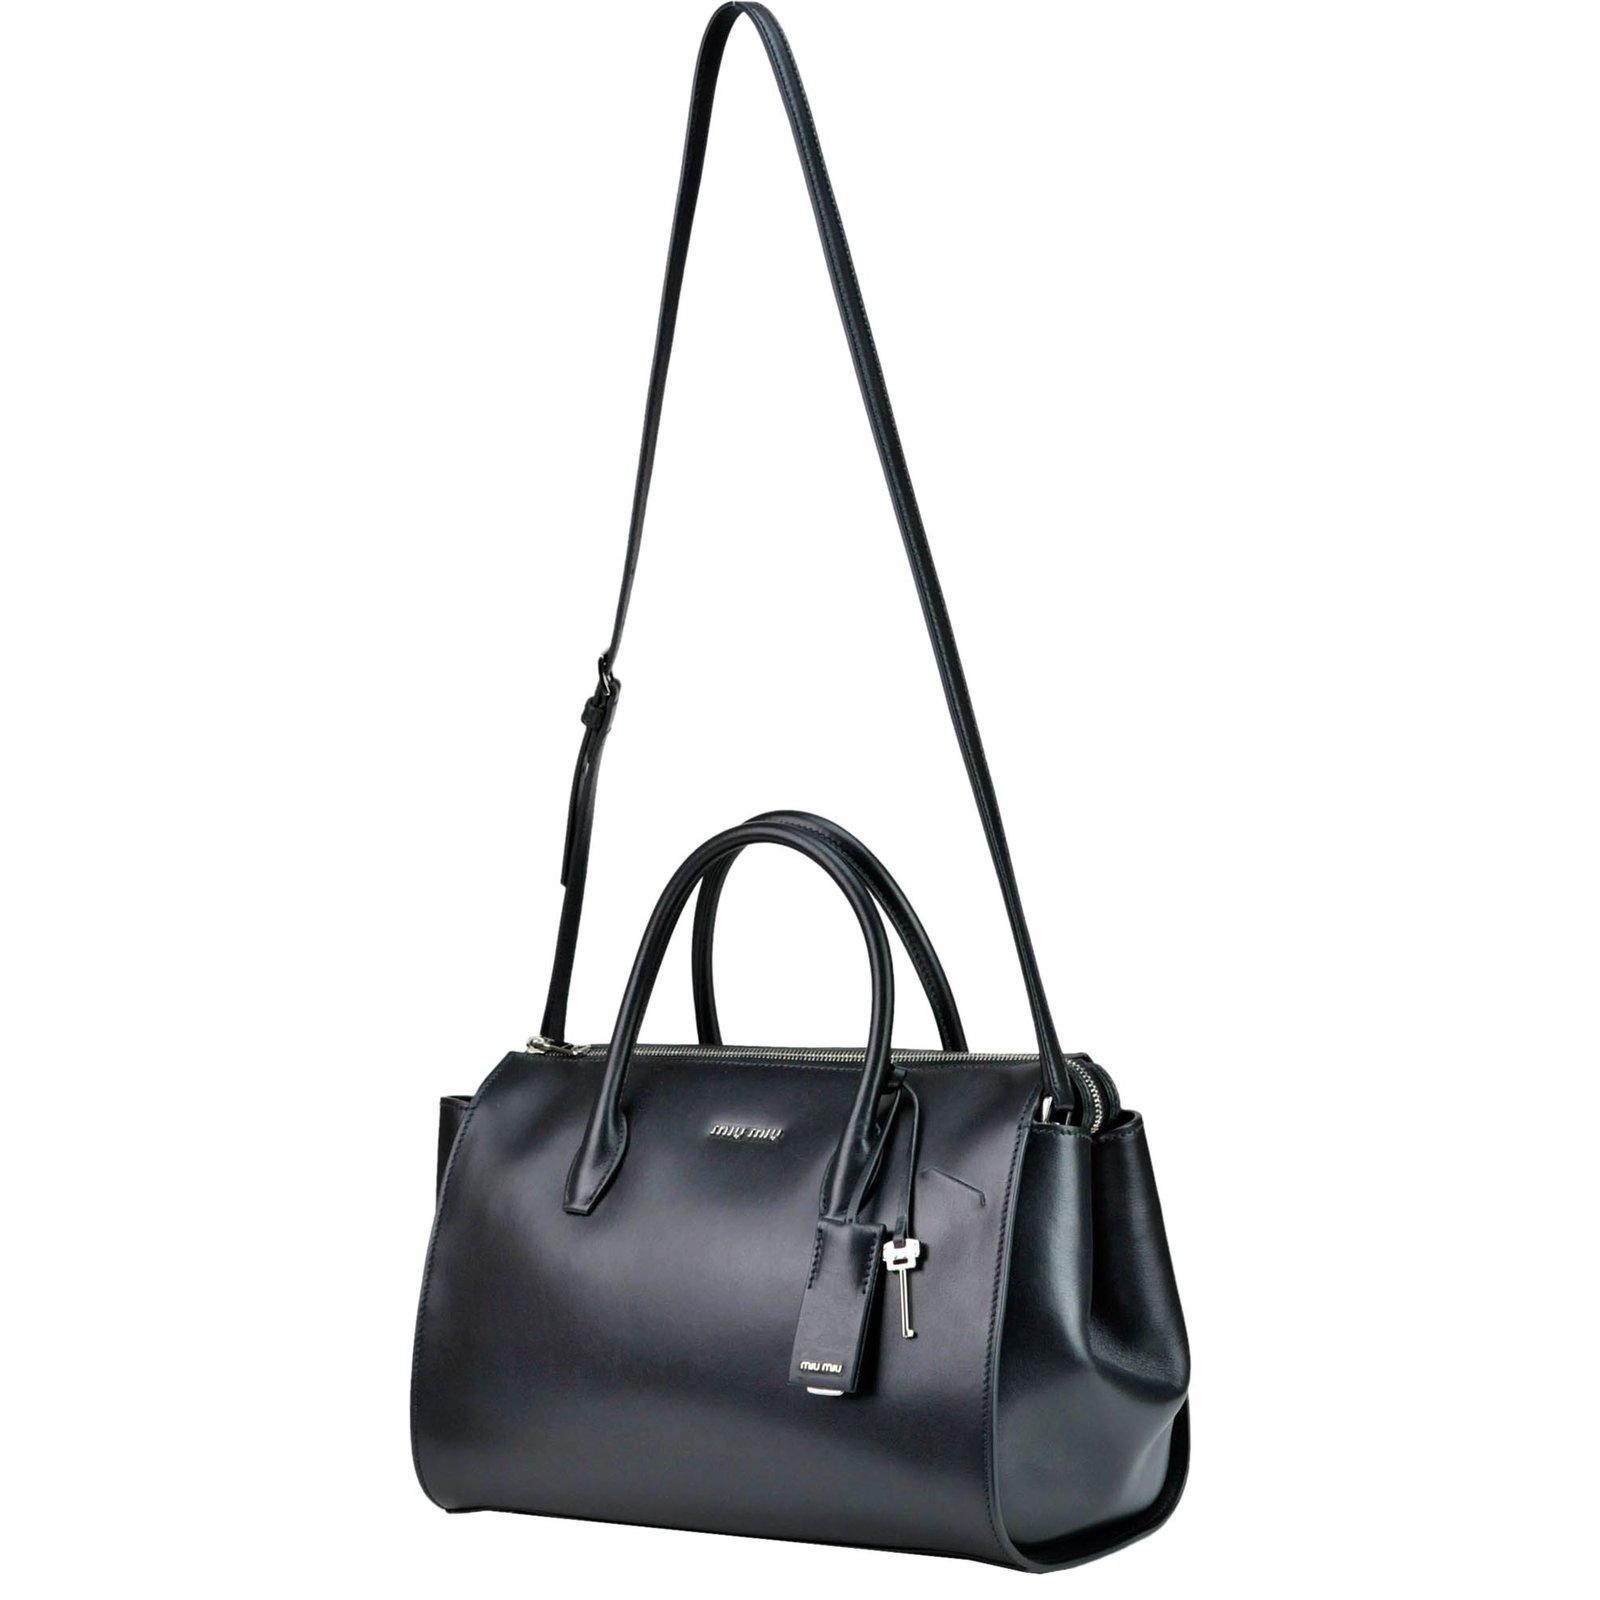 15ec087c1f8c Miu Miu Boston bag miumiu new Handbags Leather Black ref.72916 - Joli Closet